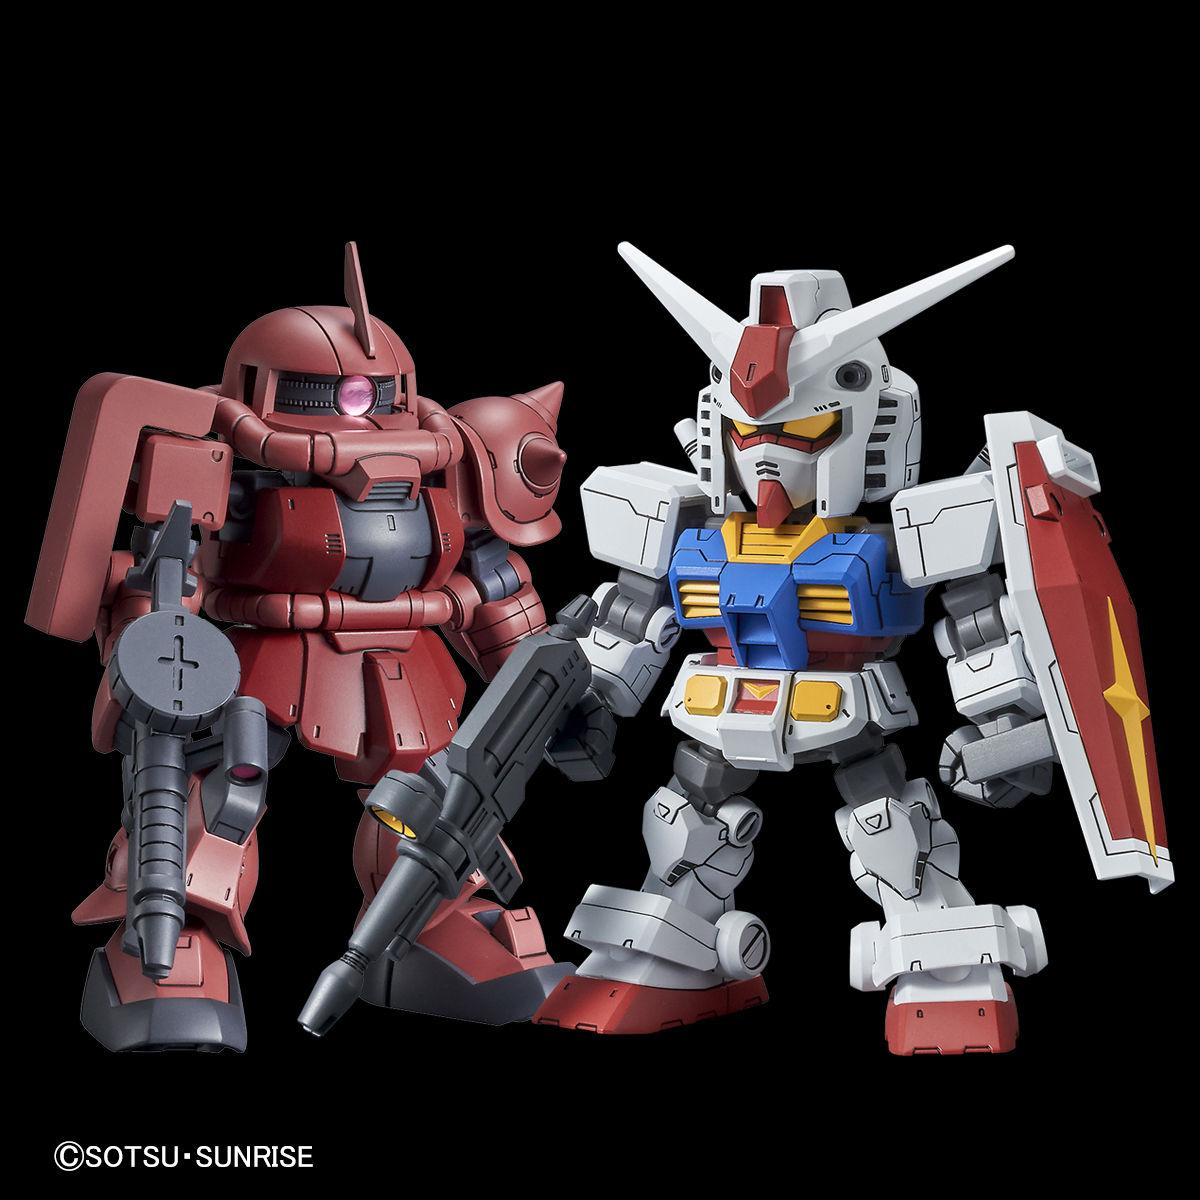 GUNDAM.MY: SD Gundam Cross Silhouette RX-78-2 Gundam & MS-06S ZAKU II landed